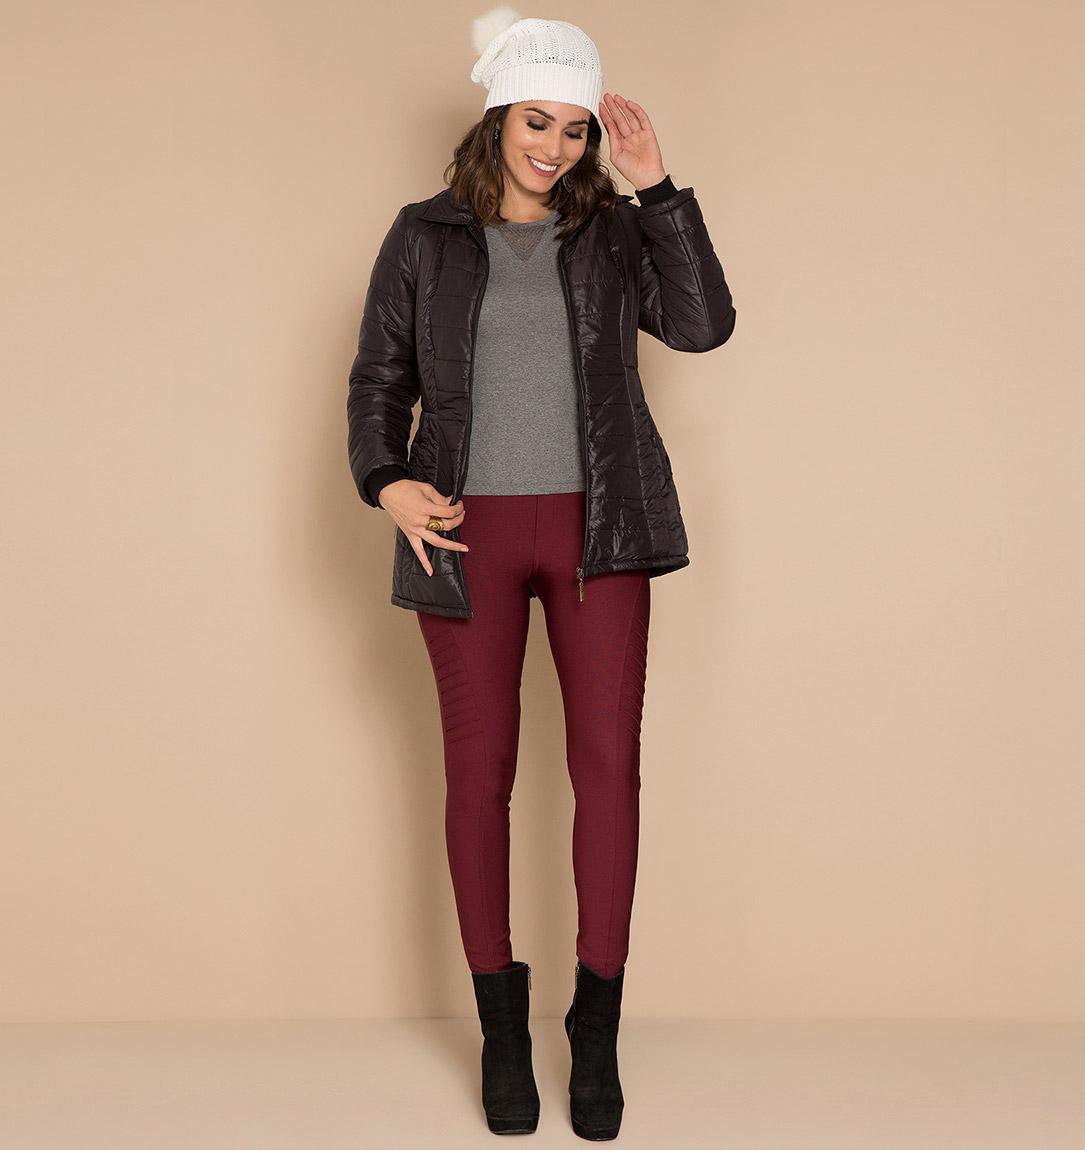 menina vestindo roupa de inverno